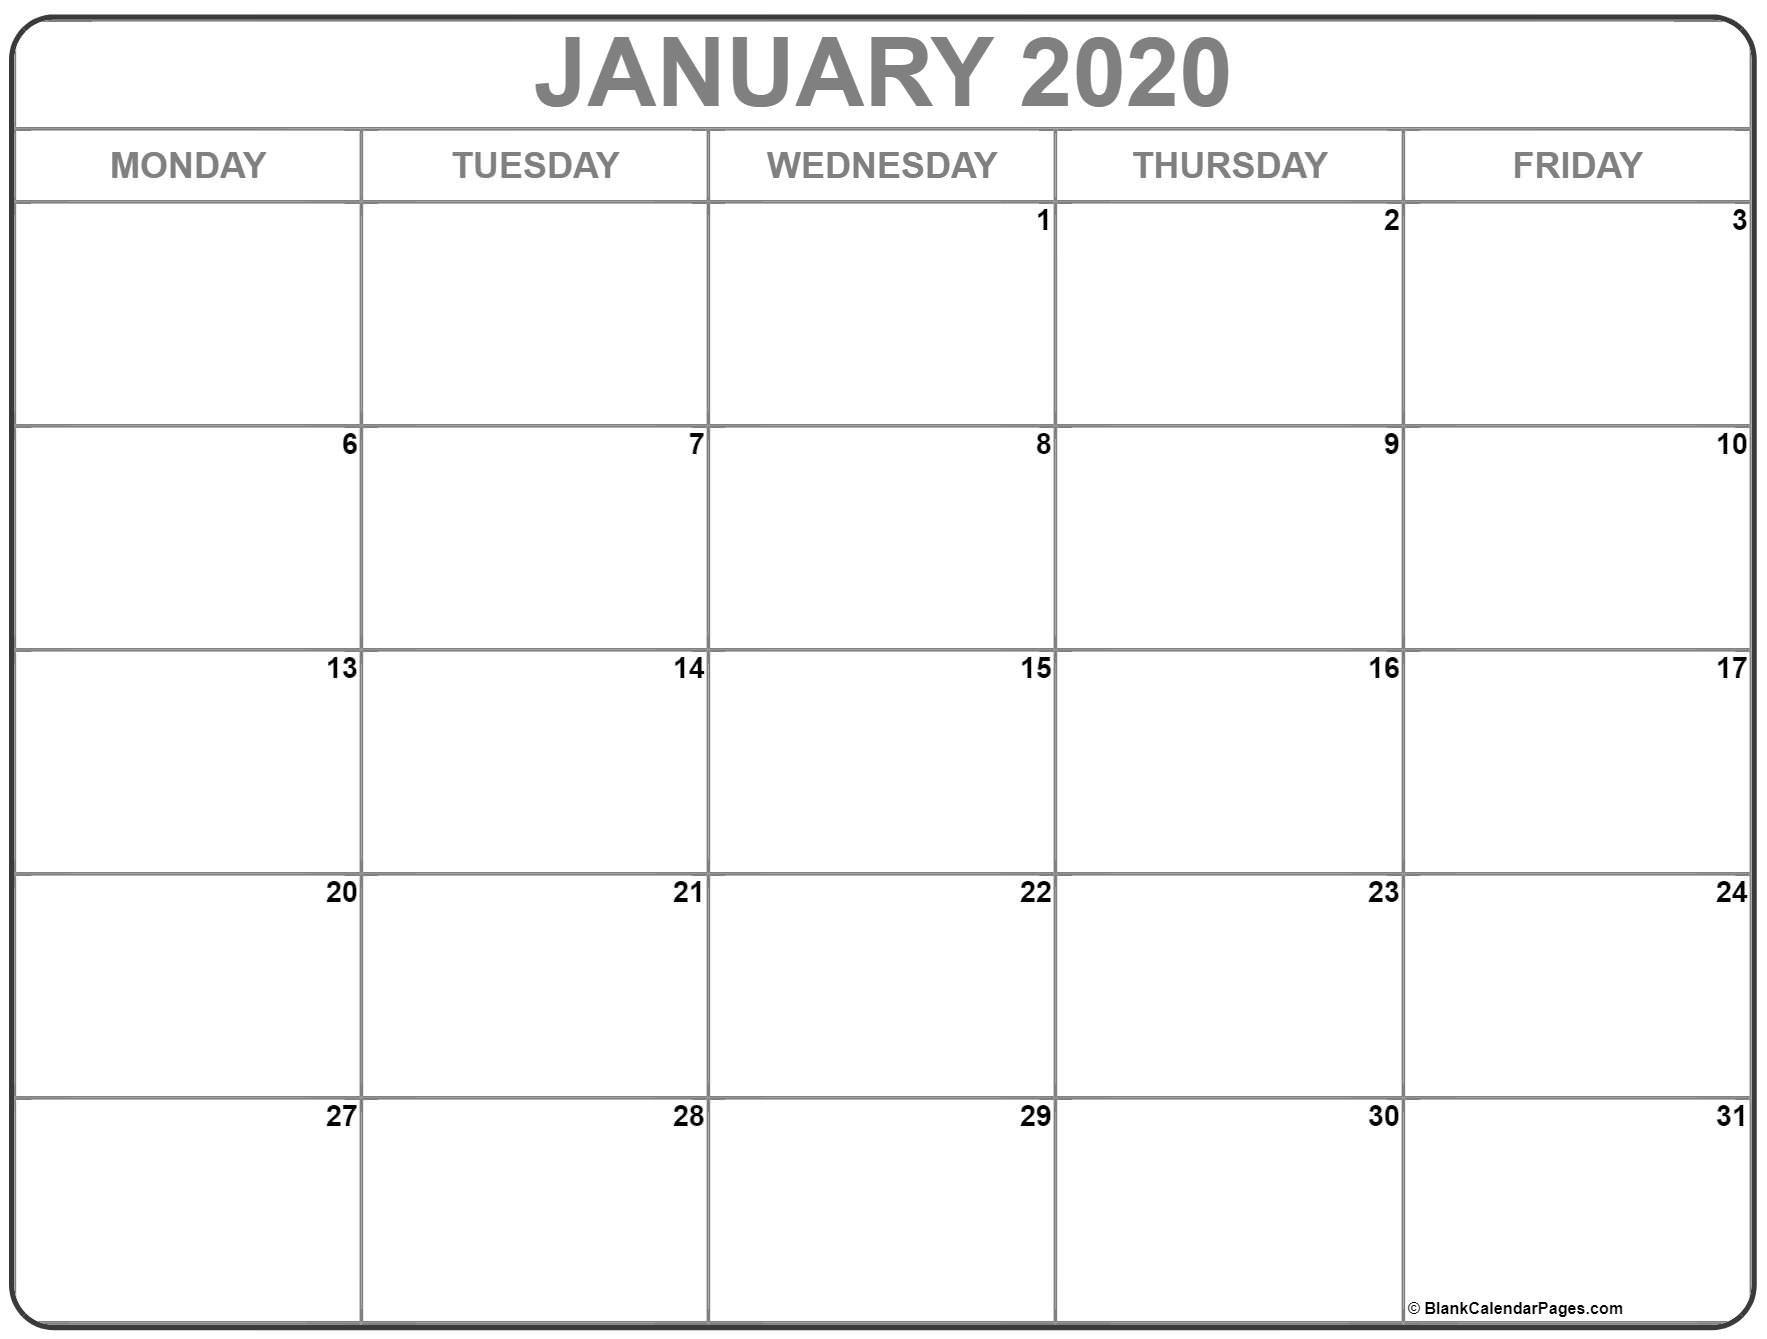 January 2020 Monday Calendar   Monday To Sunday Monday Thru Friday Printable Calendar